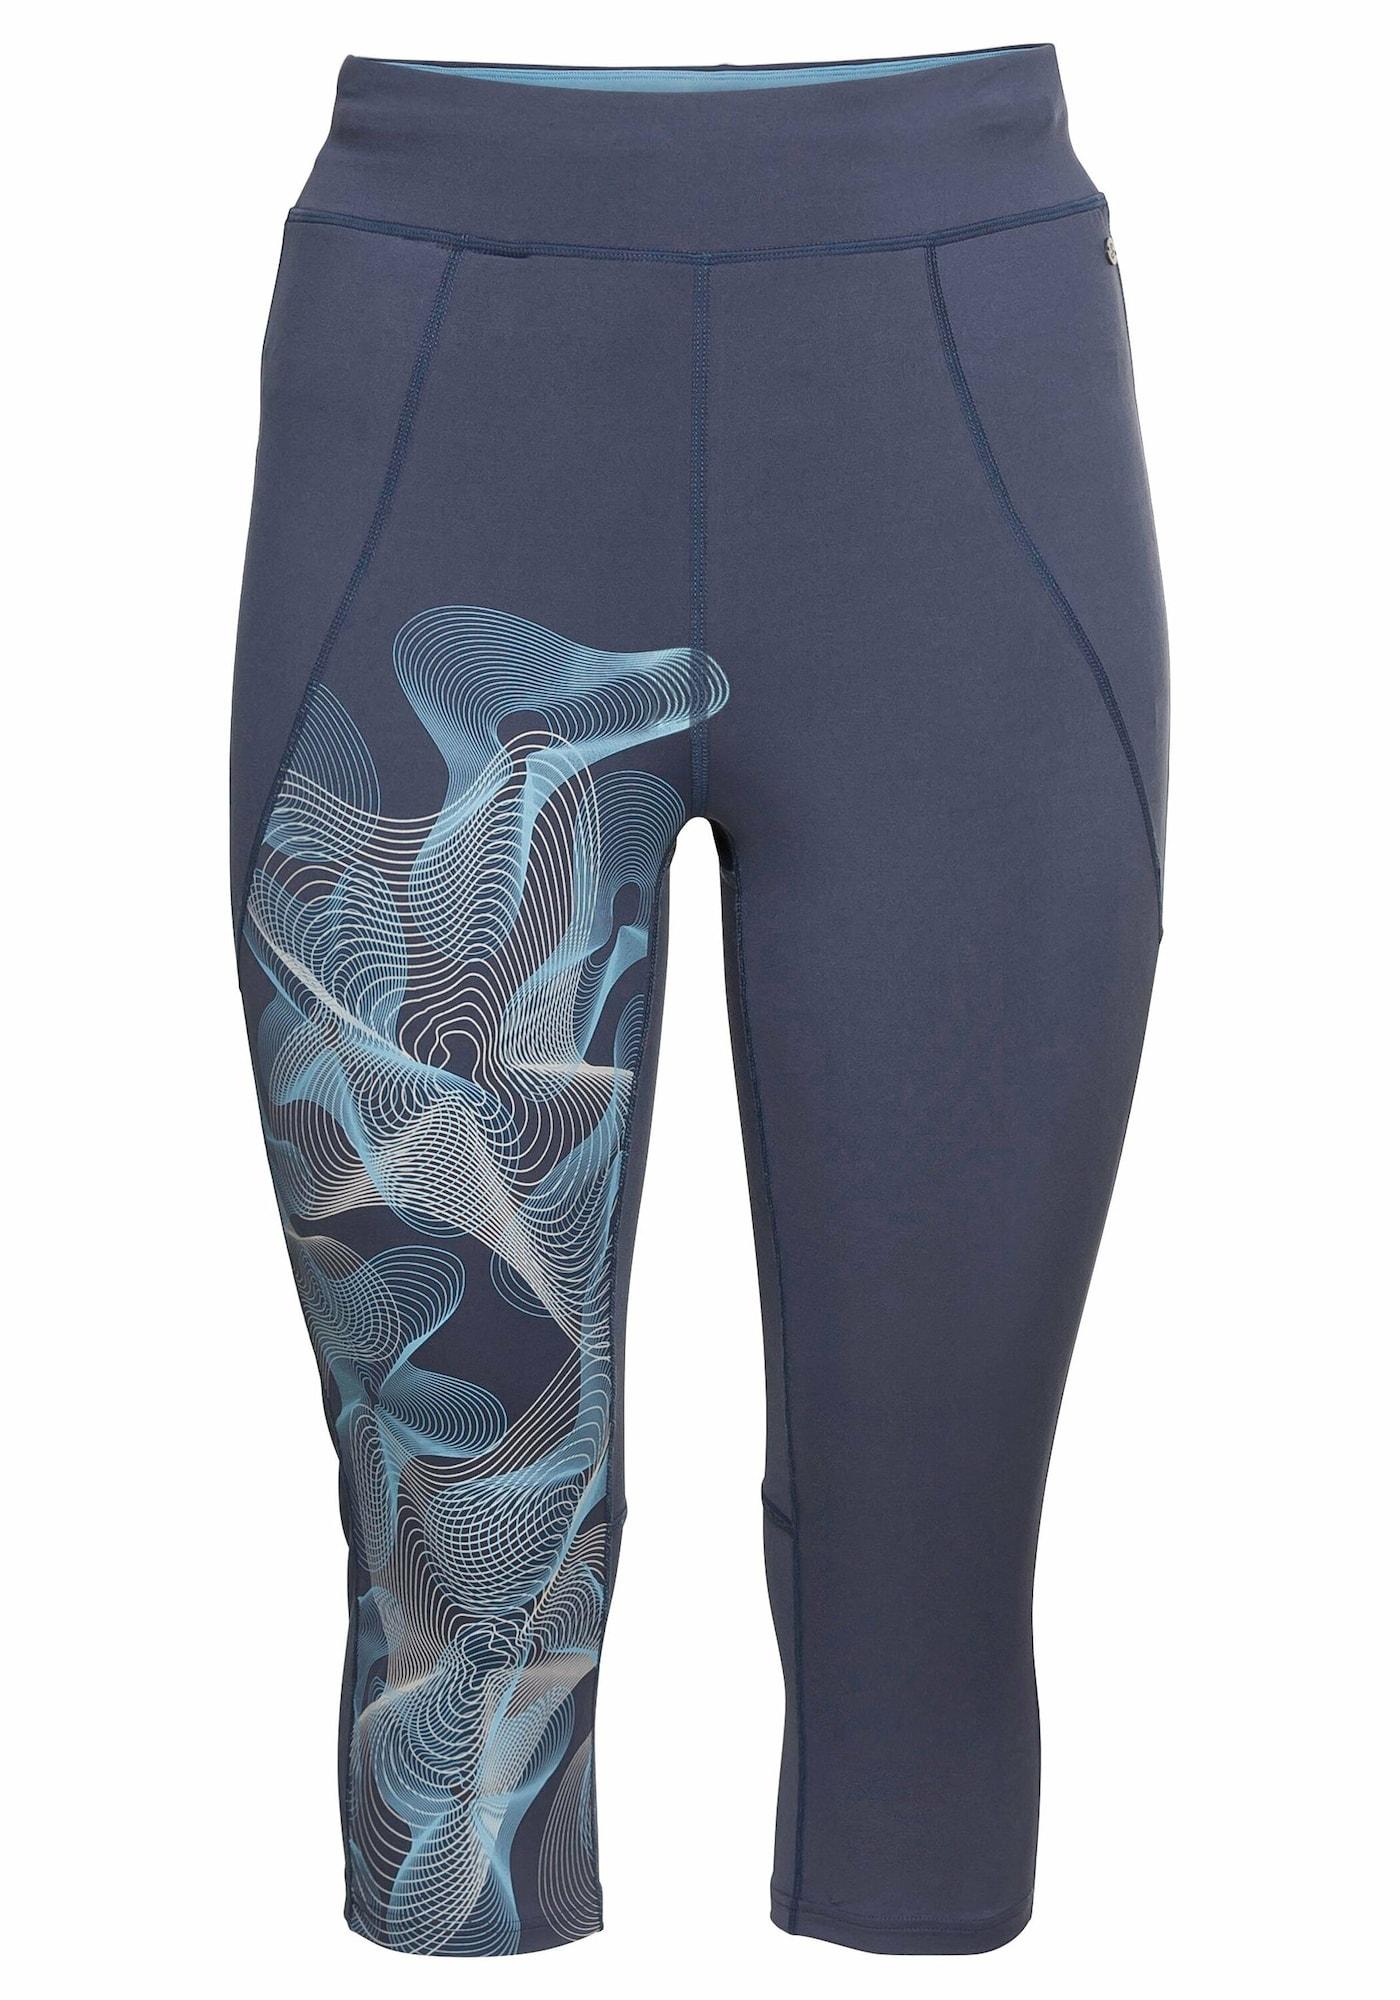 SHEEGO Sportinės kelnės mėlyna dūmų spalva / šviesiai mėlyna / balta